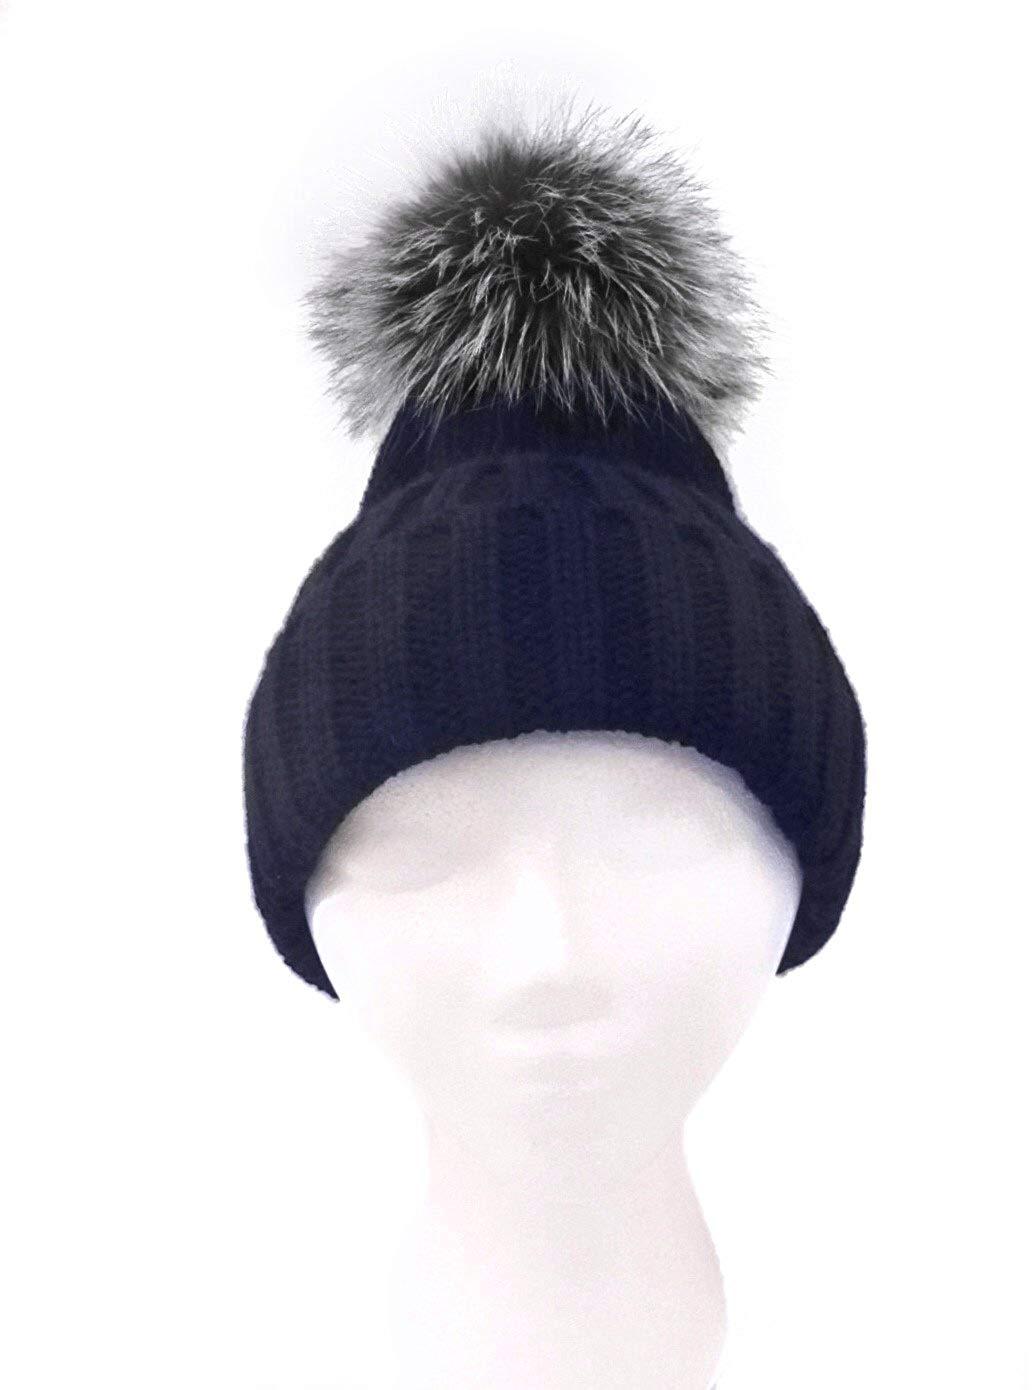 5bd2b015464e8 Get Quotations · ANNABELLE NEW YORK Knit Beanie Hat with Detachable Fox Pom  Pom